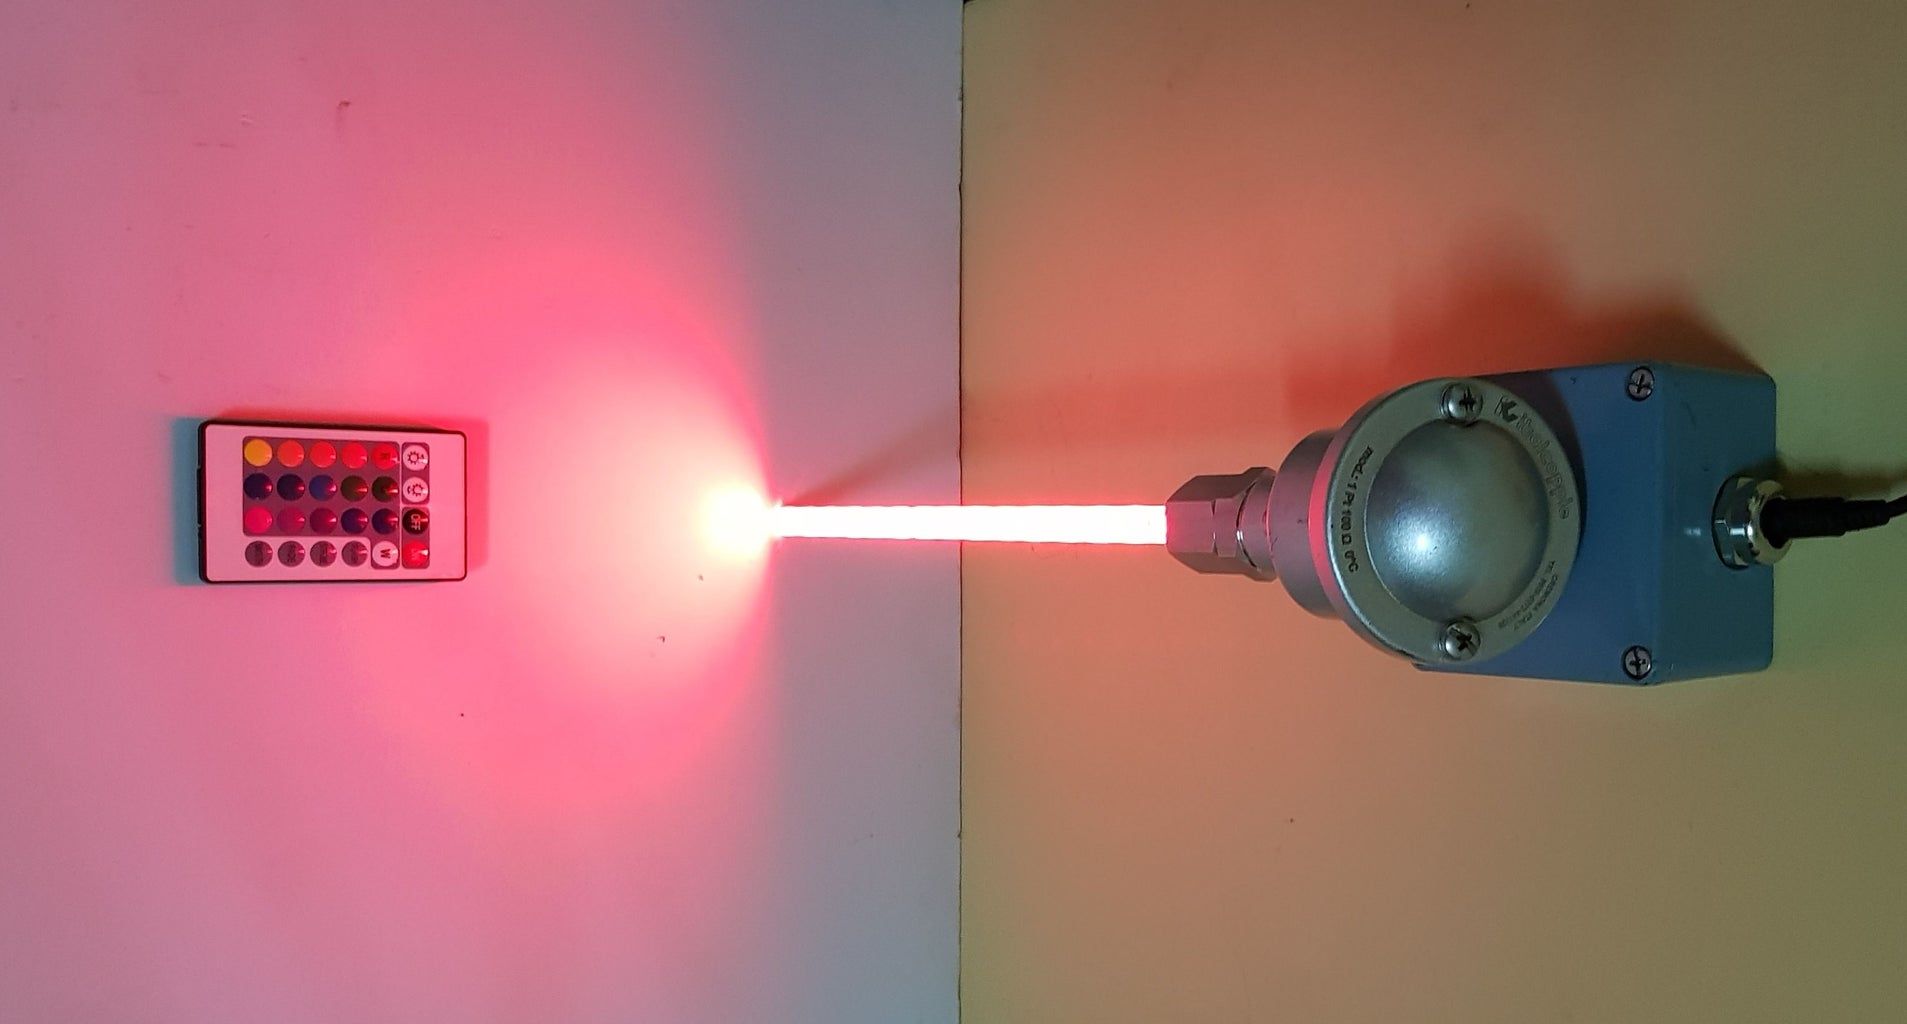 Thermocouple LED